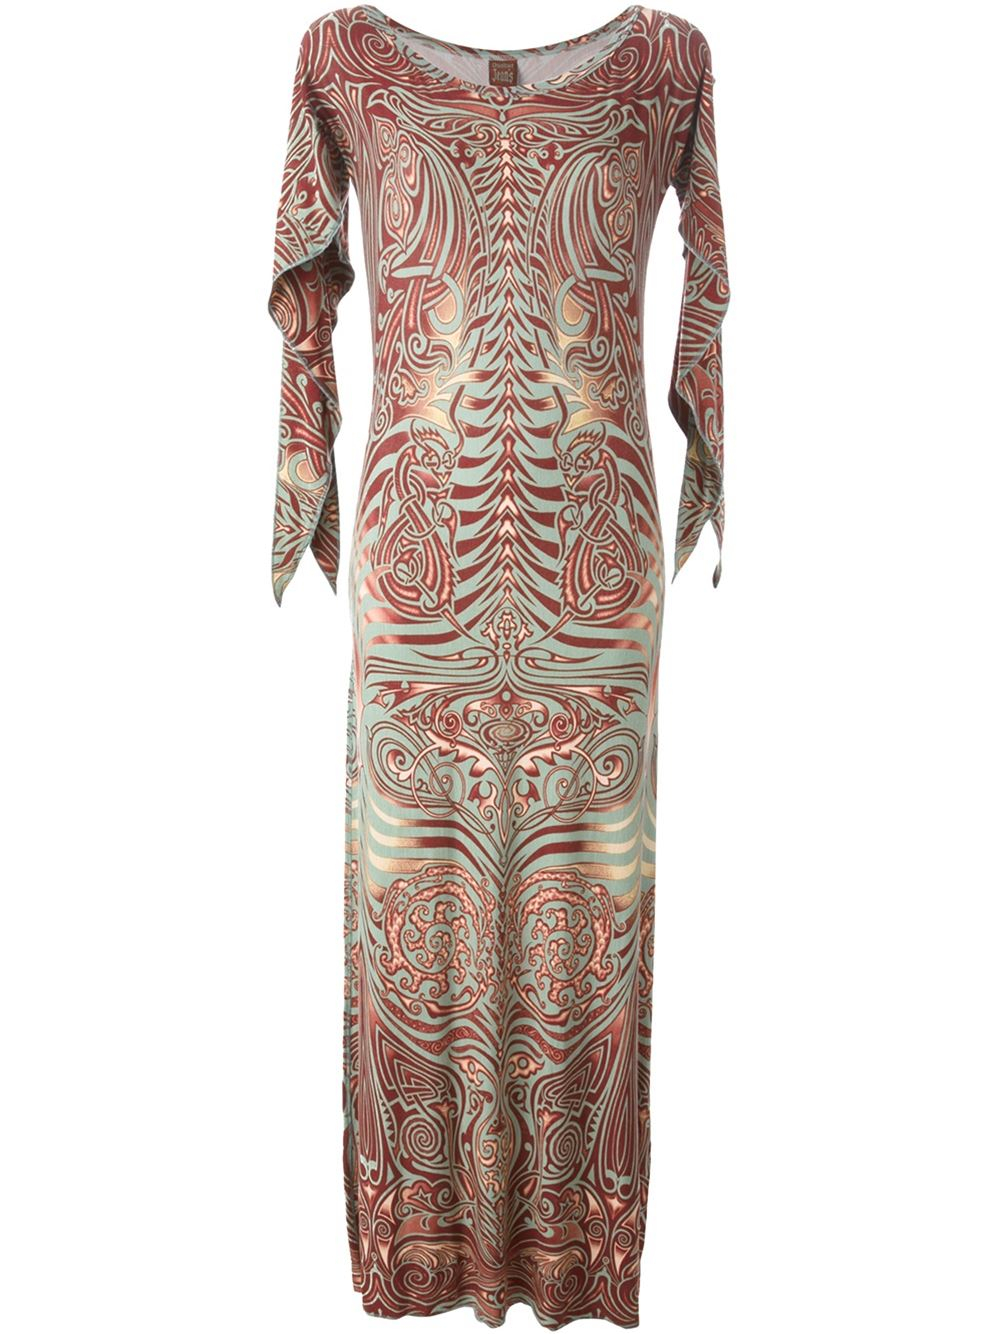 jean paul gaultier 39 cyberbaba 39 dress in multicolor brown. Black Bedroom Furniture Sets. Home Design Ideas